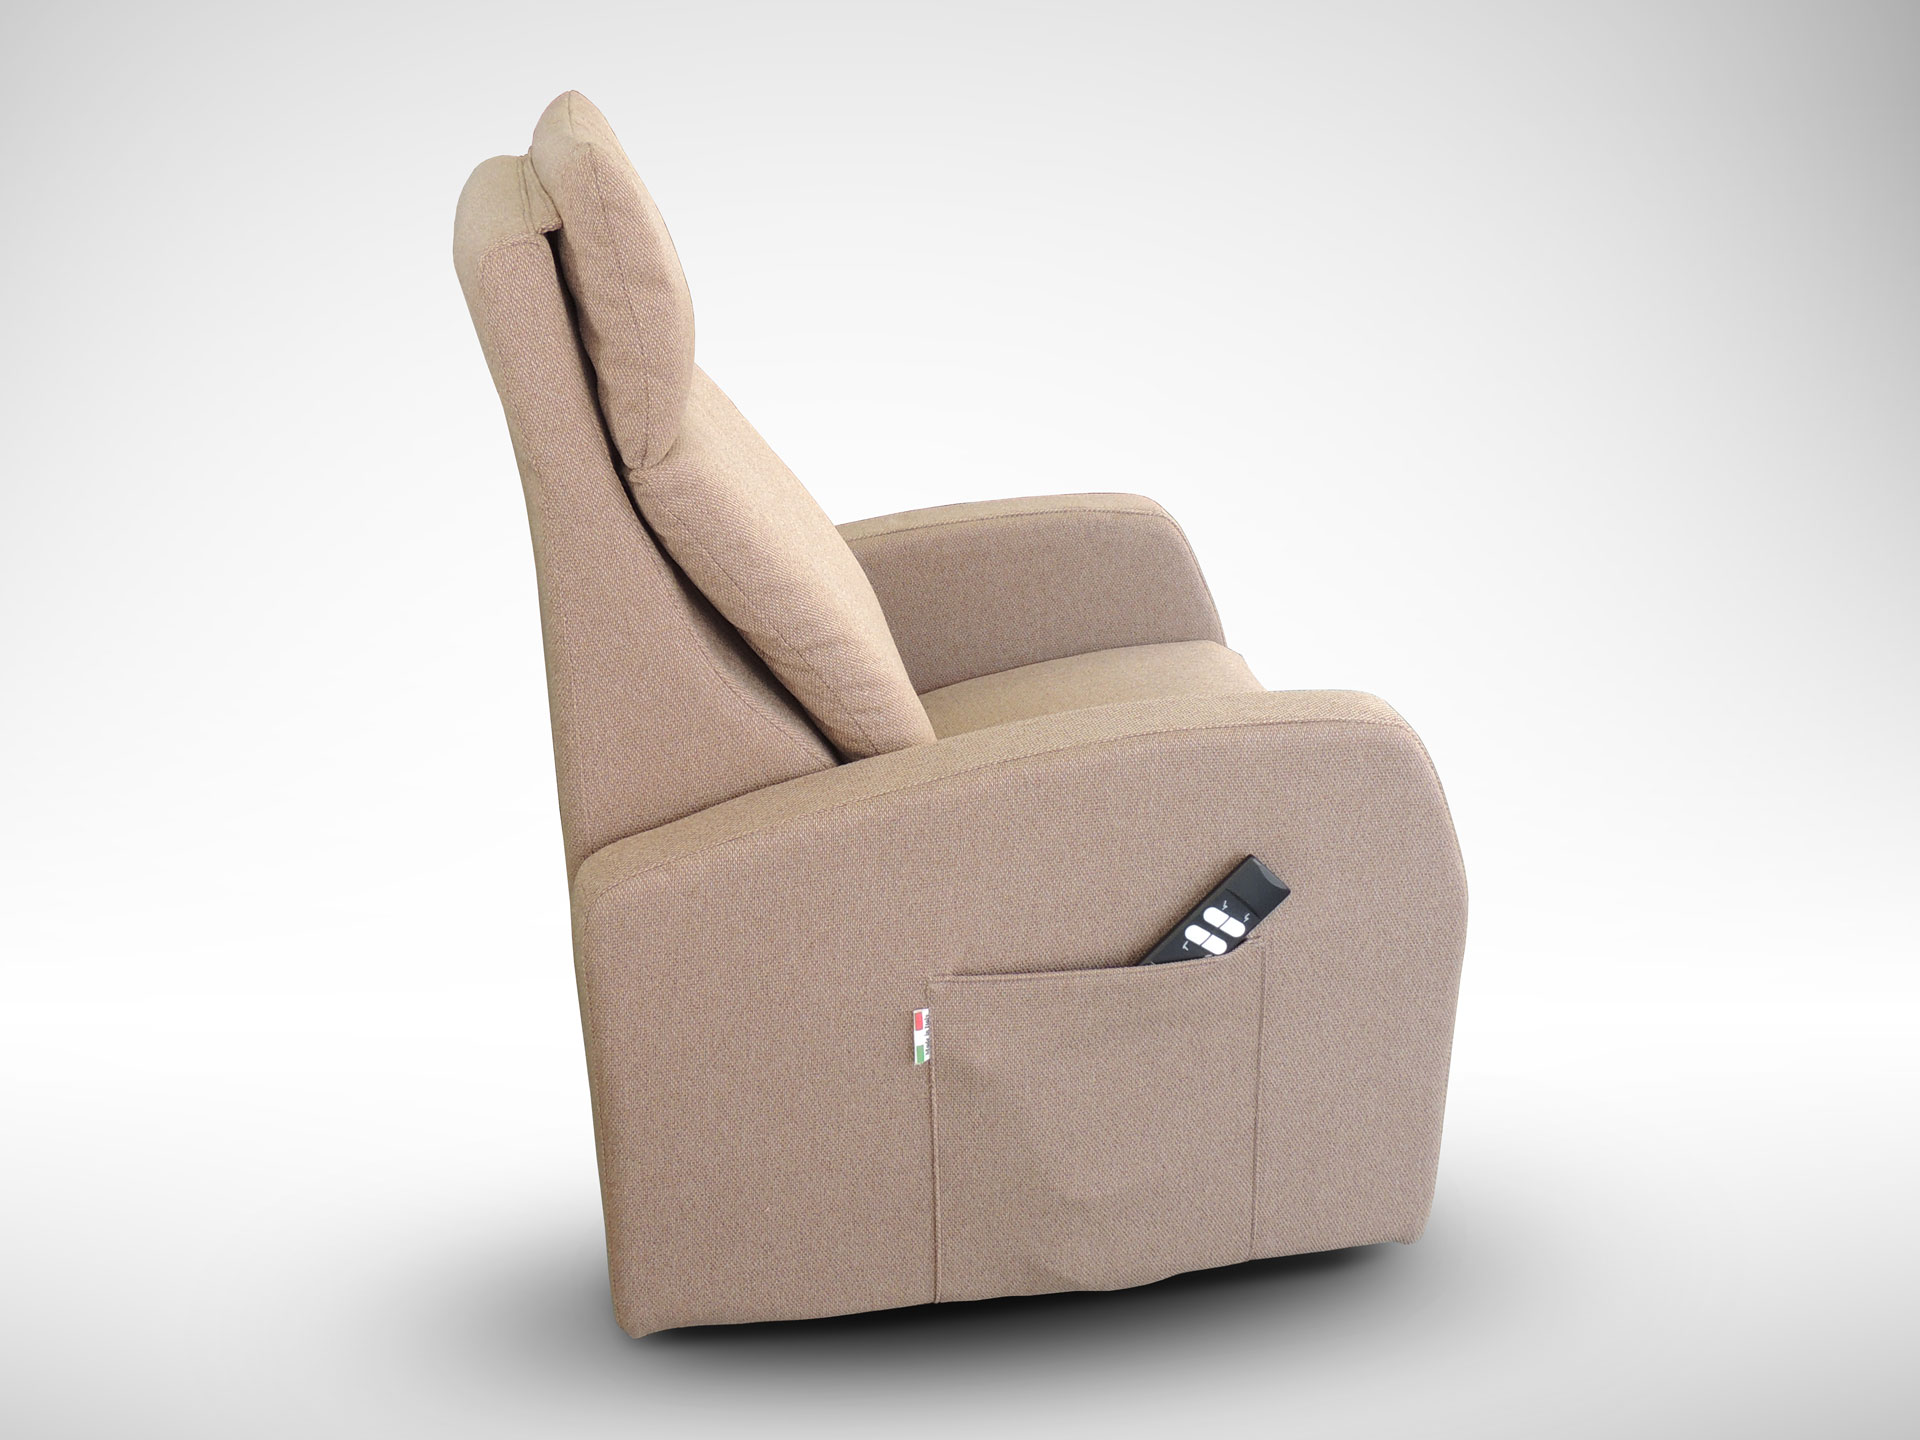 Altezza Seduta Minima Poltrona